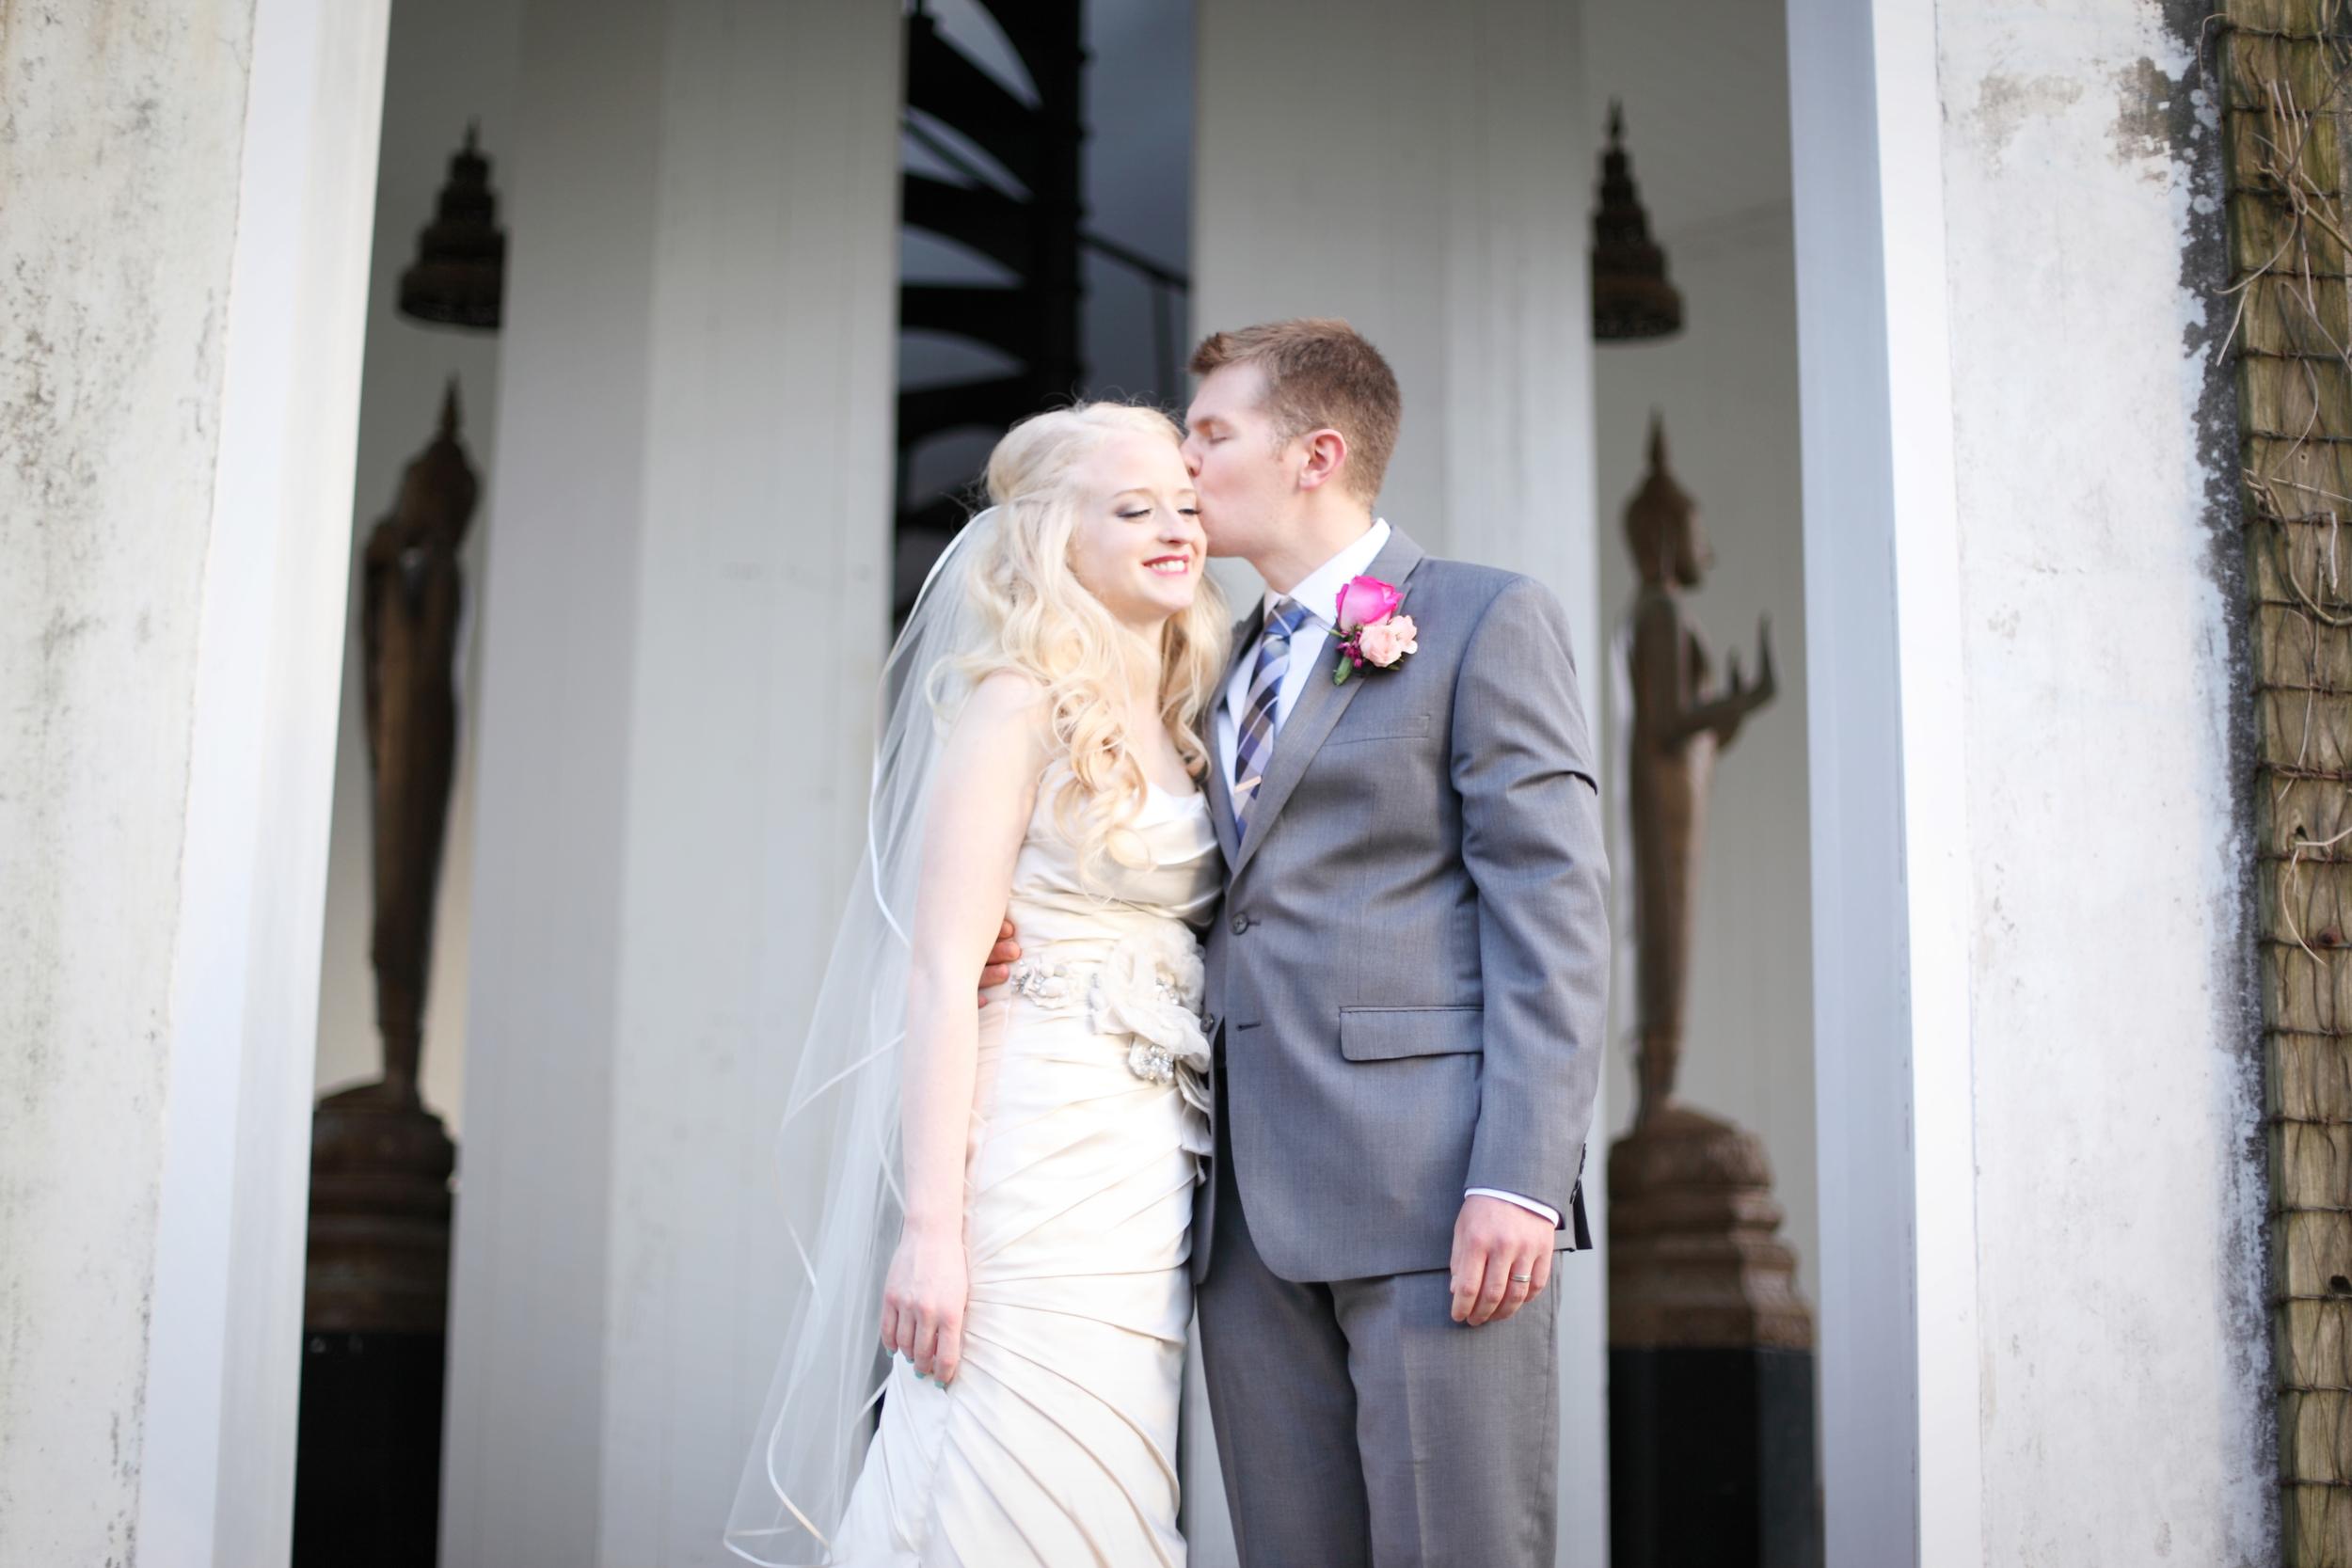 06_Fox_and_Hound_Photo_Wedding_Photography_4/12/14